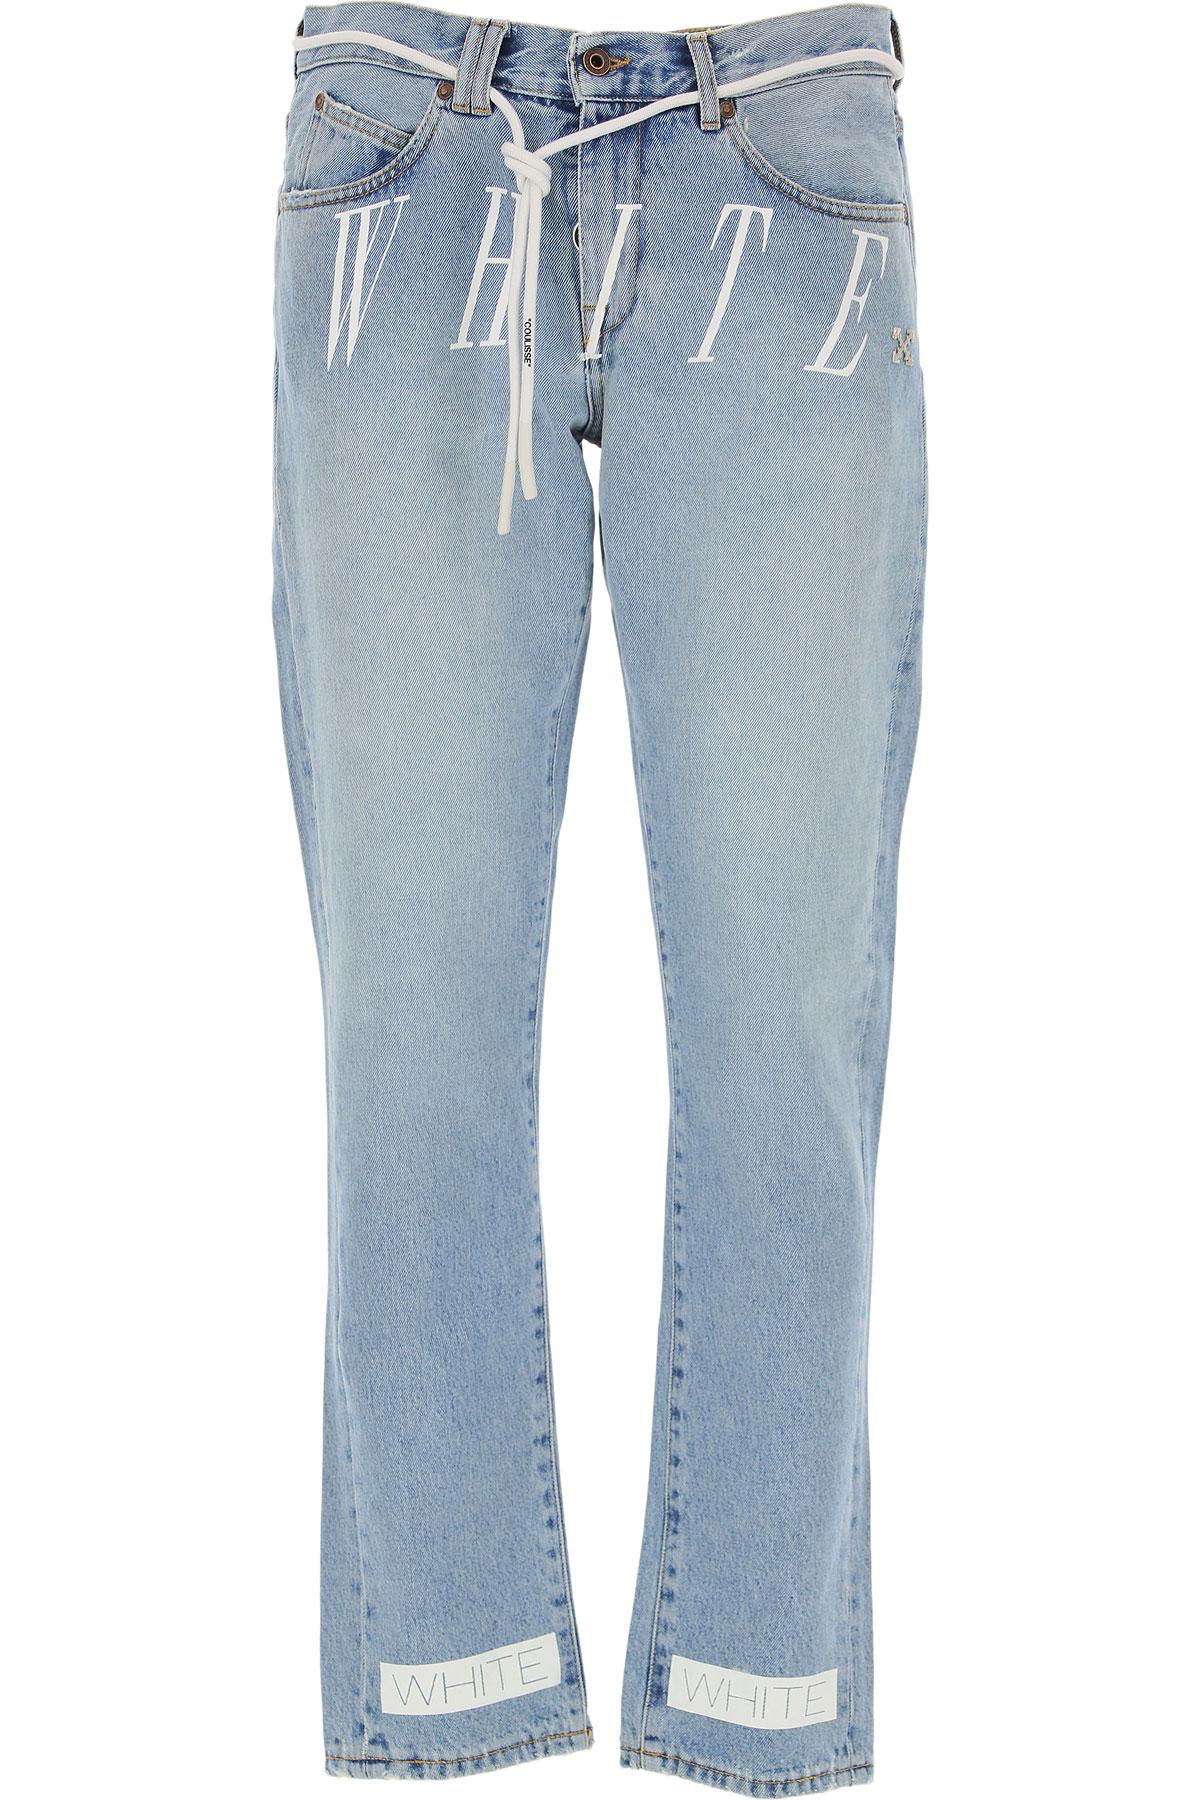 Off-White Virgil Abloh Jeans On Sale, Light Denim Blue, Cotton, 2019, 30 31 32 33